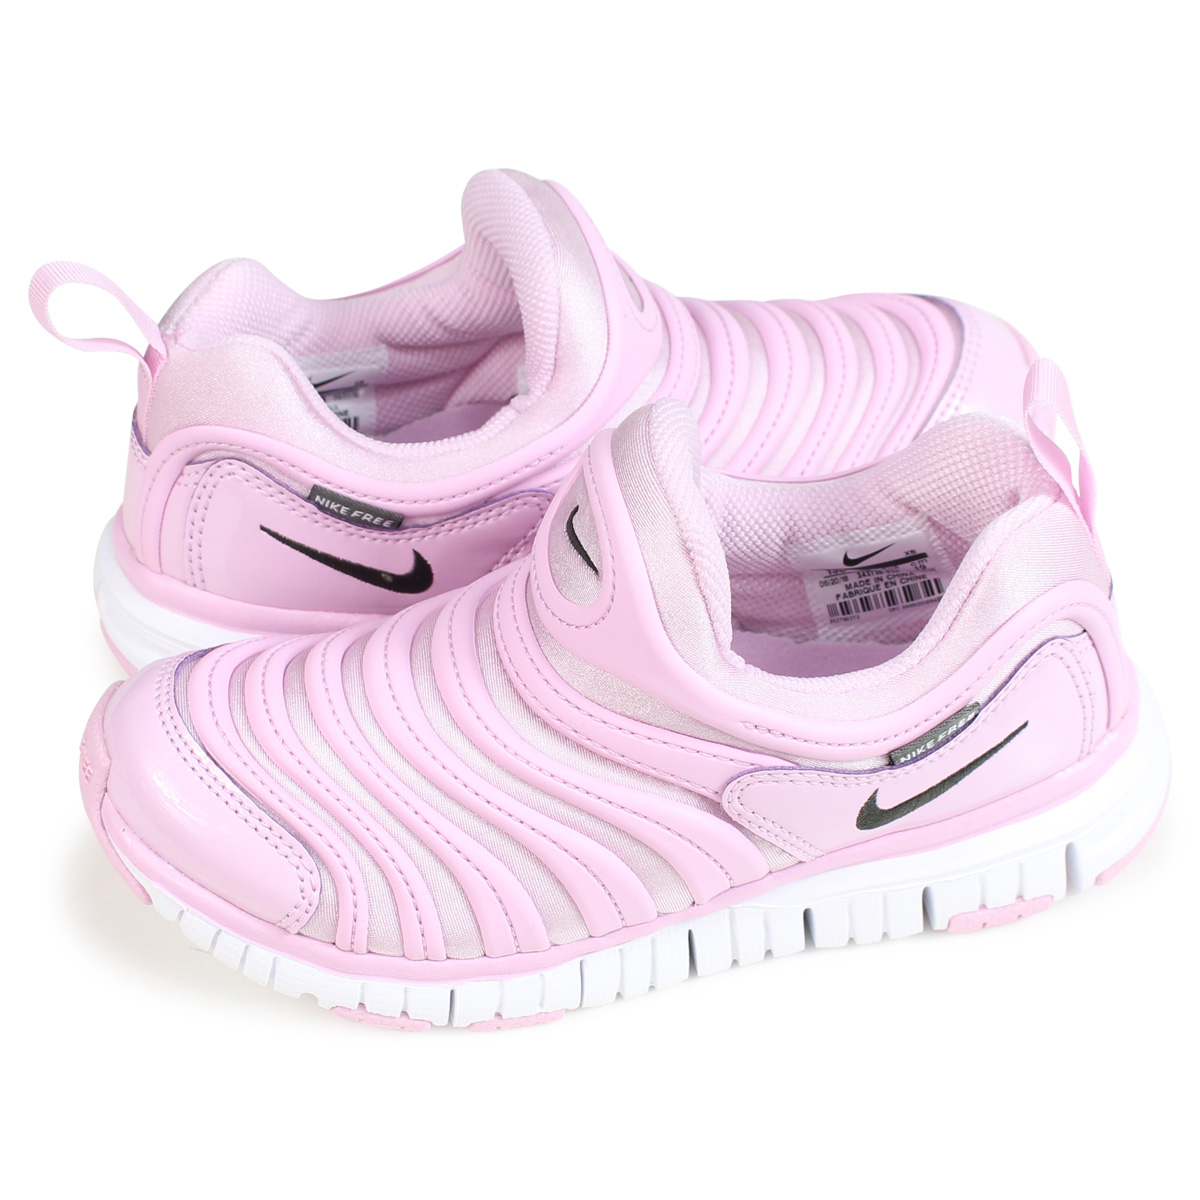 c68e77337eed8 ALLSPORTS  Nike NIKE dynamo-free kids sneakers DYNAMO FREE PS ...